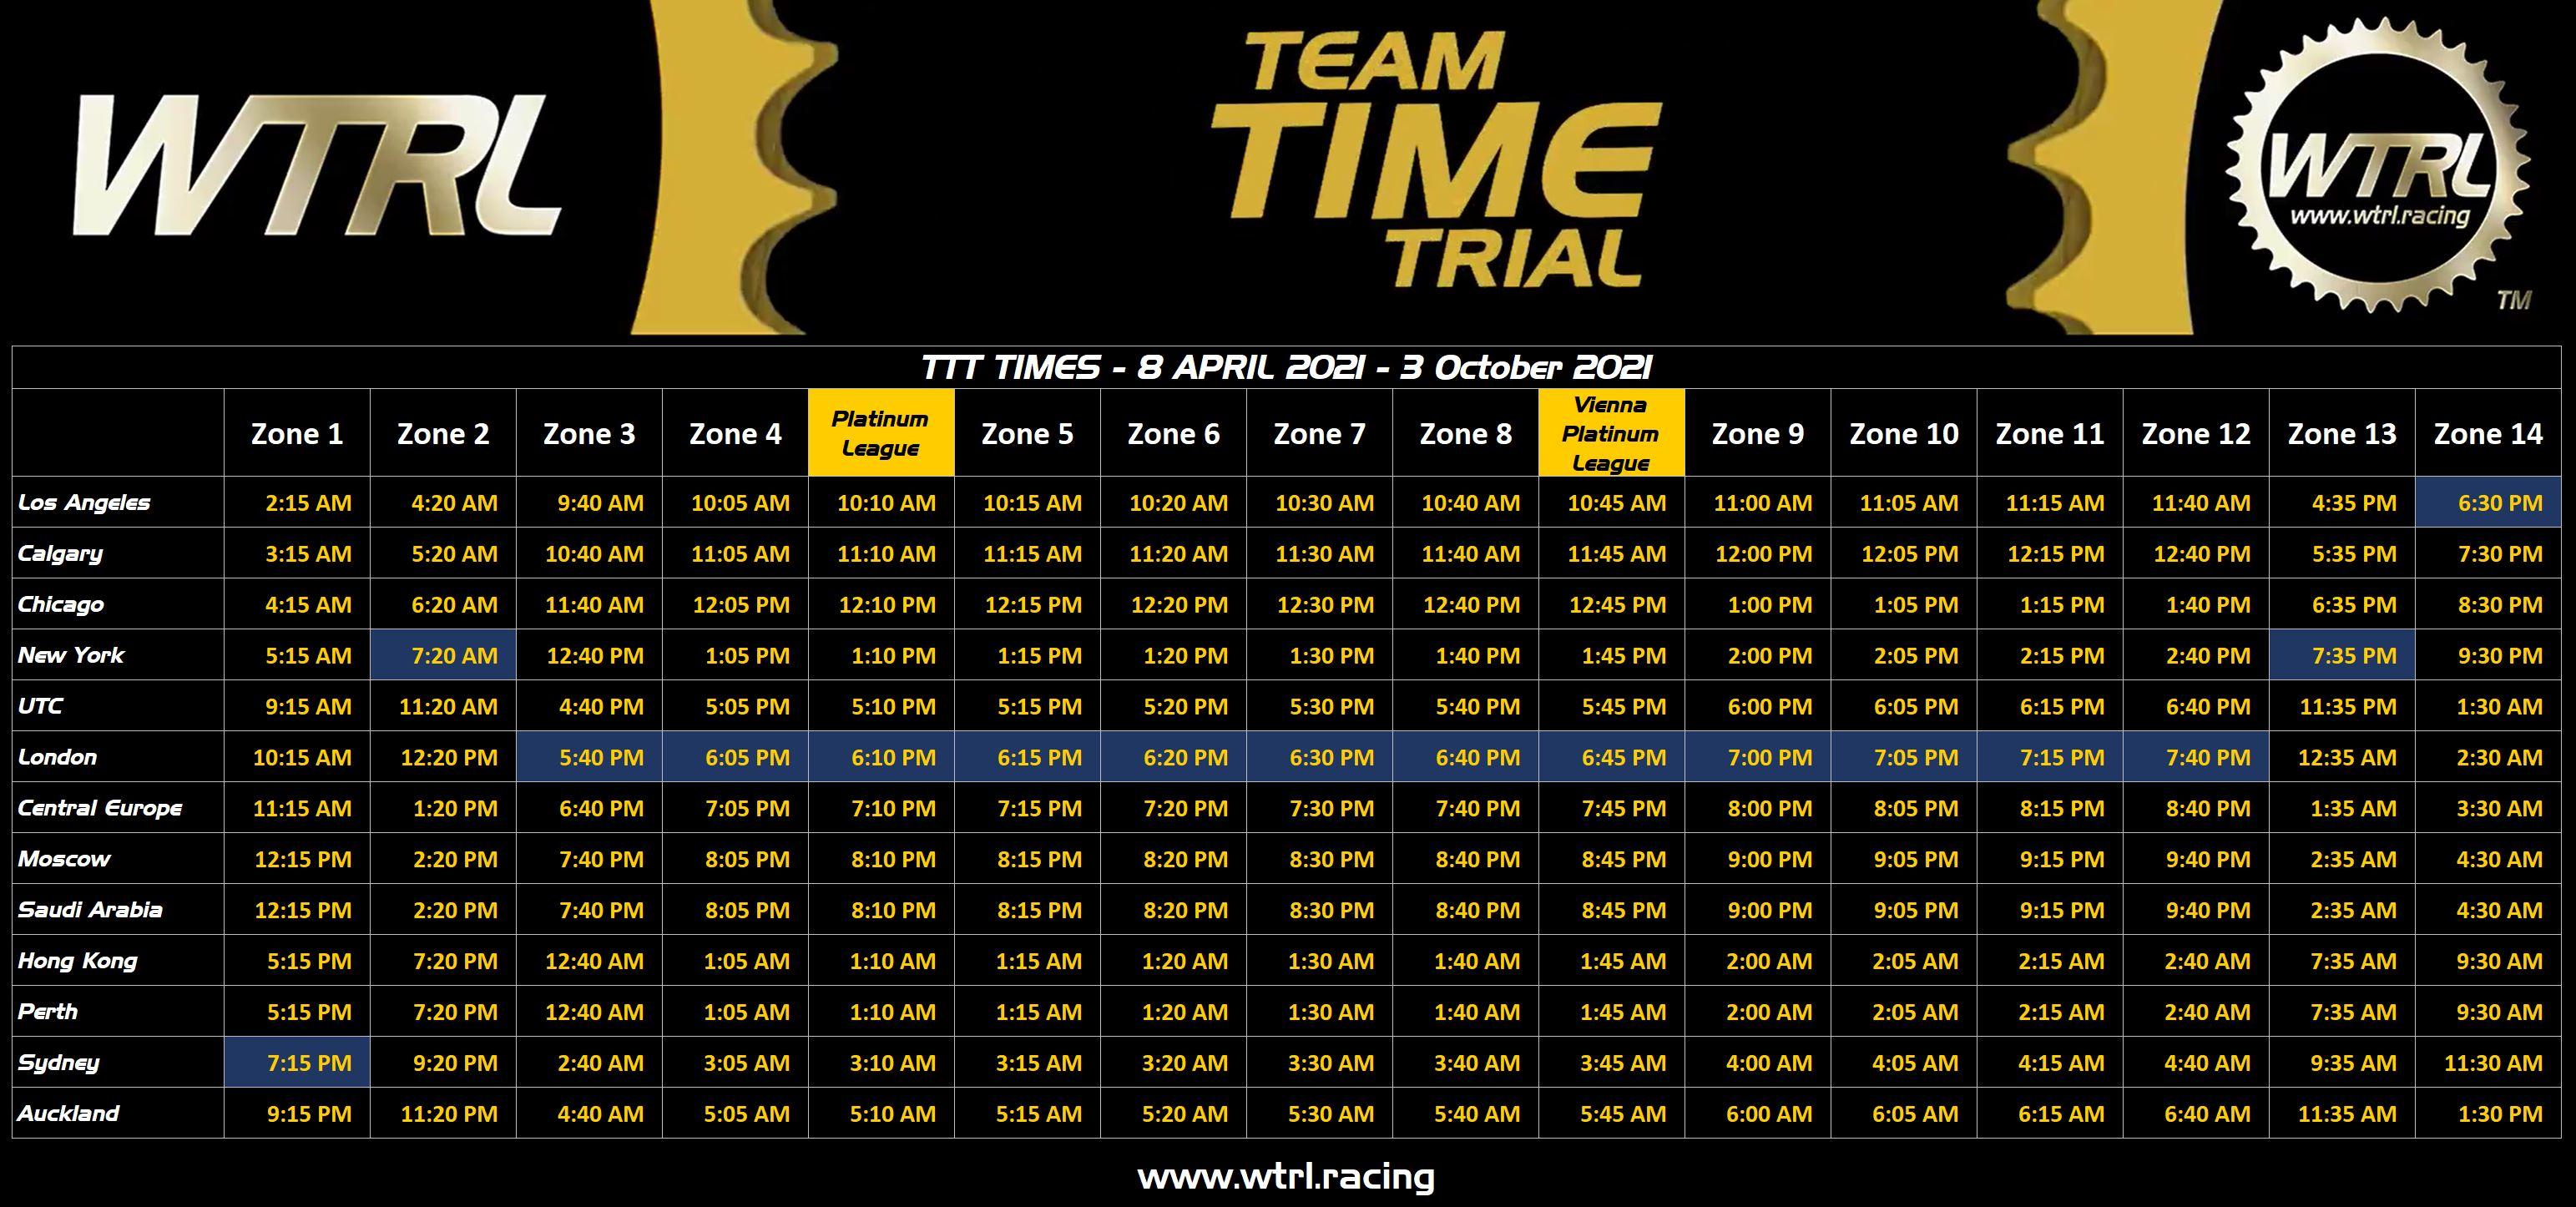 WTRL Team Time Trial Times